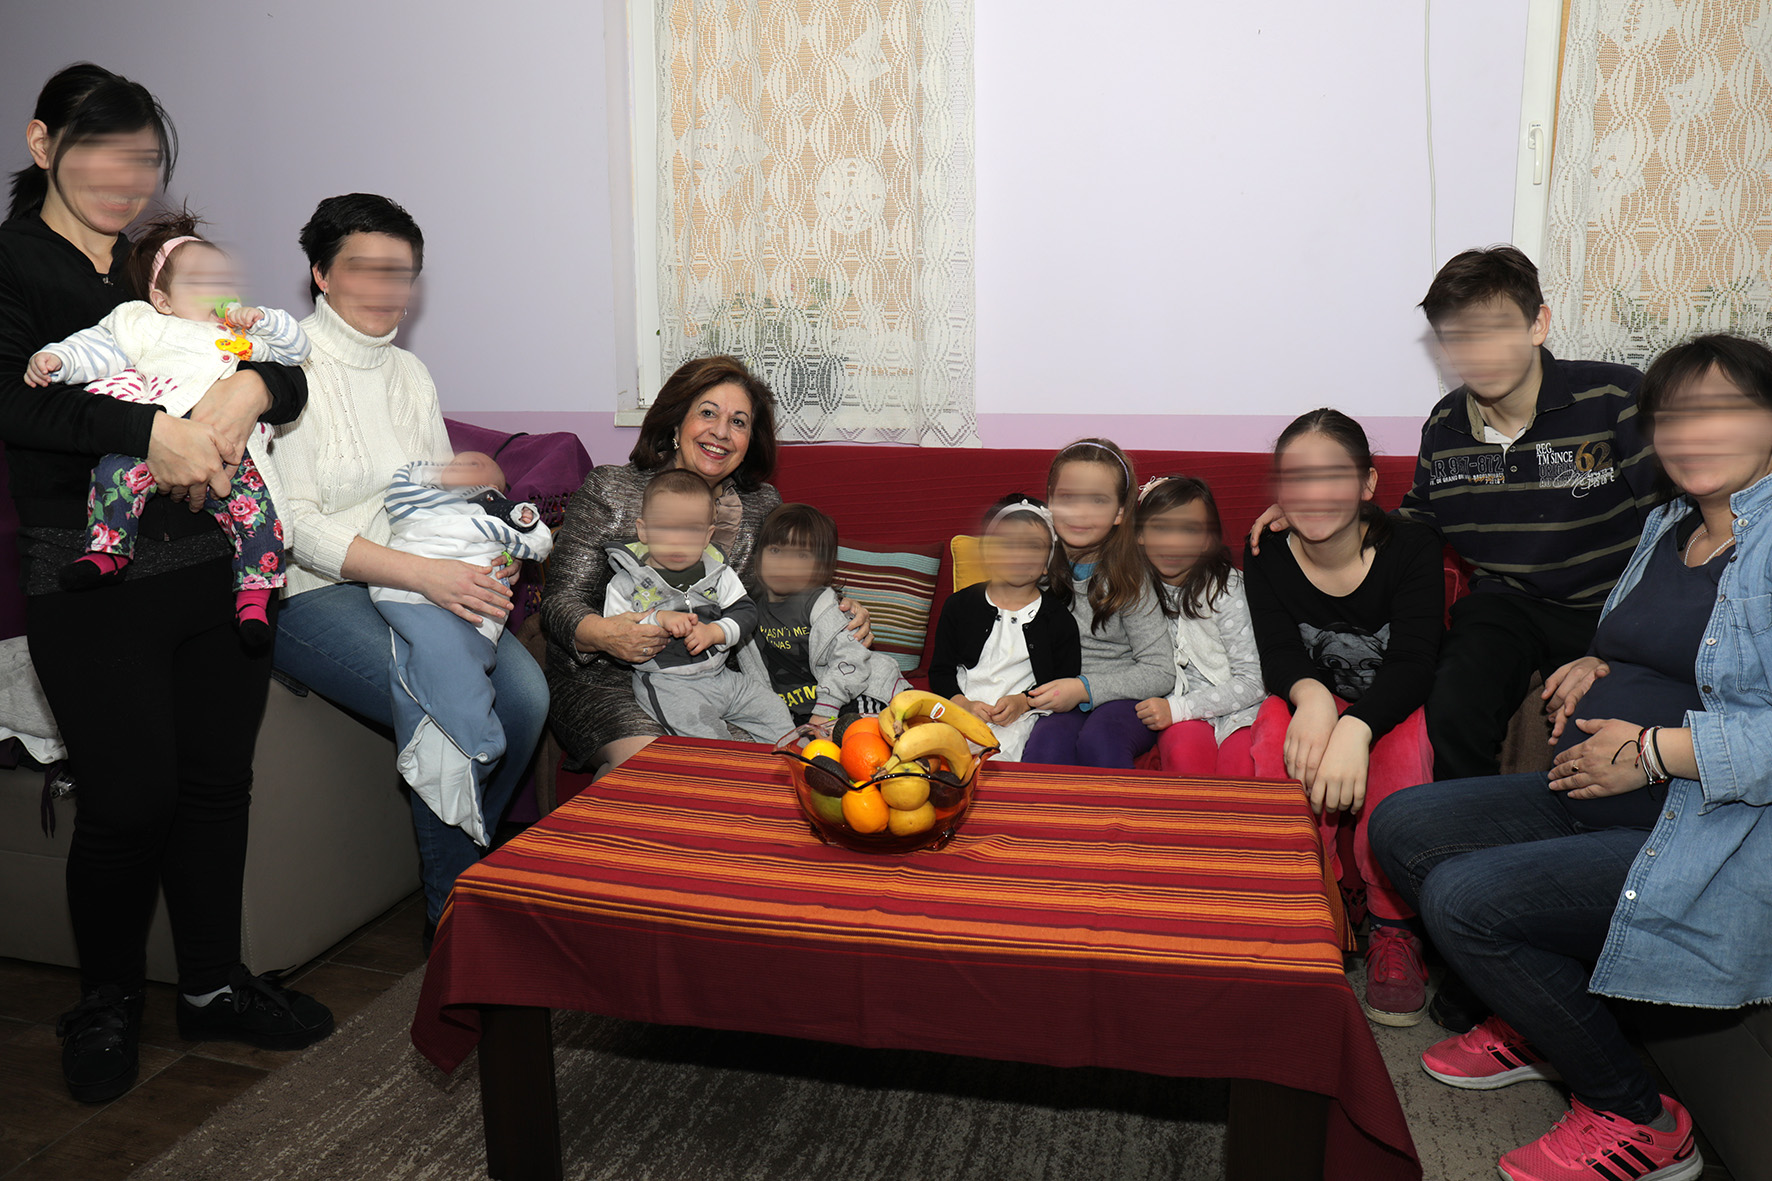 HRH Crown Princess Katherine's visit to the Safe House Belgrade